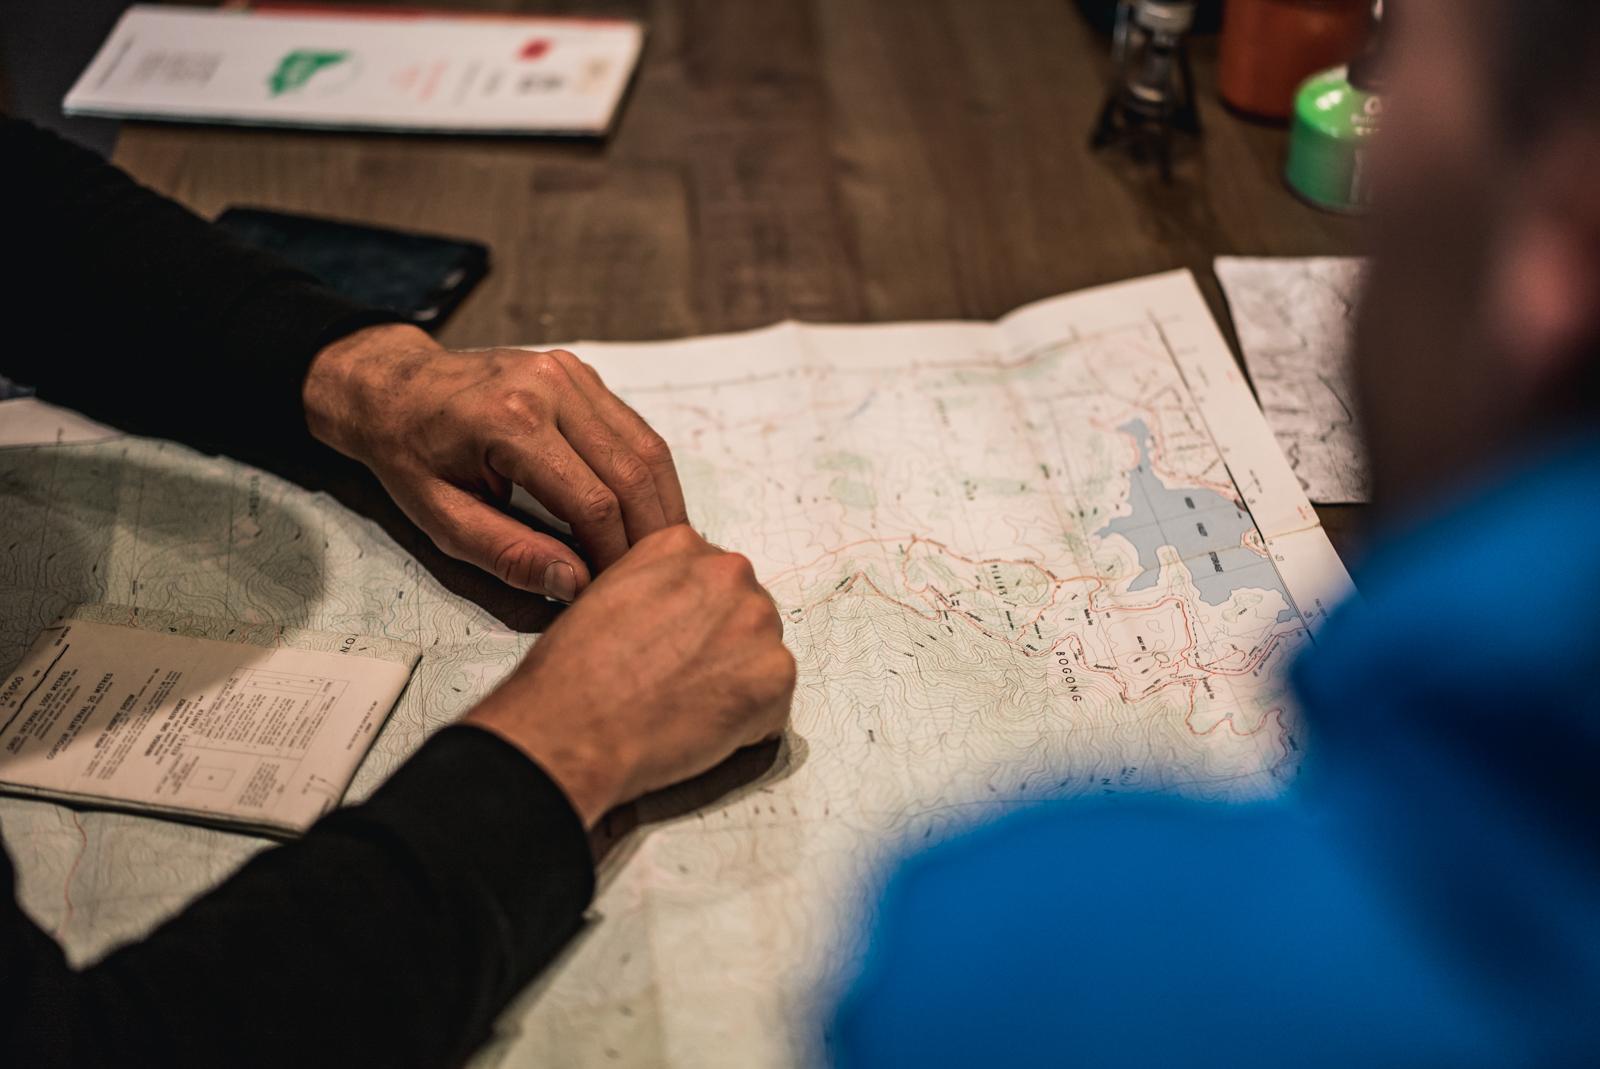 The forgotten art of map reading